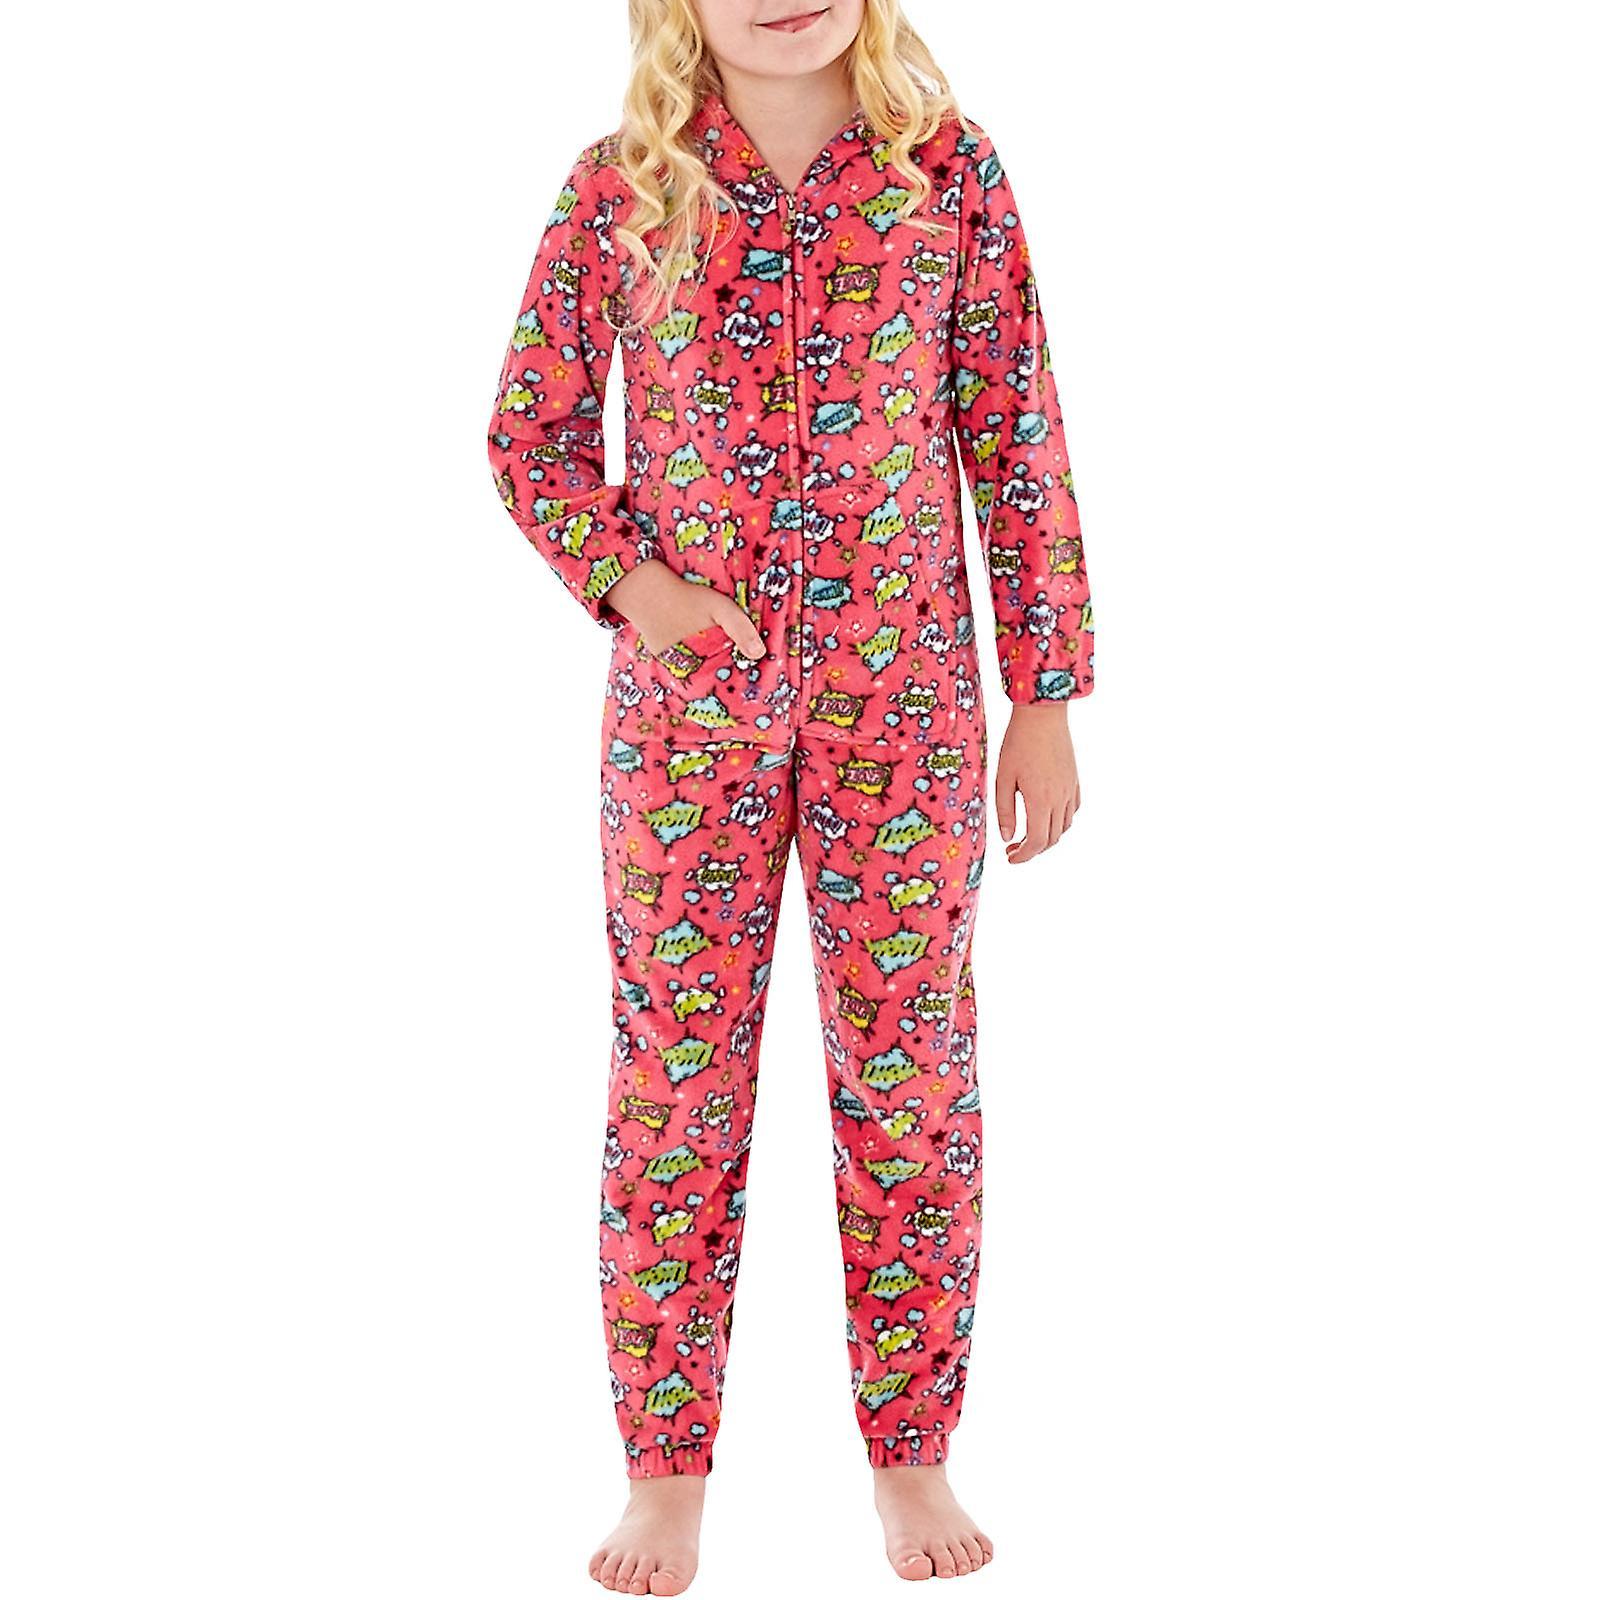 e4ed9b15ca70 Bambini ragazza Selena Childrens Long Sleeve Hooded Fleece One Piece sonno  pigiama